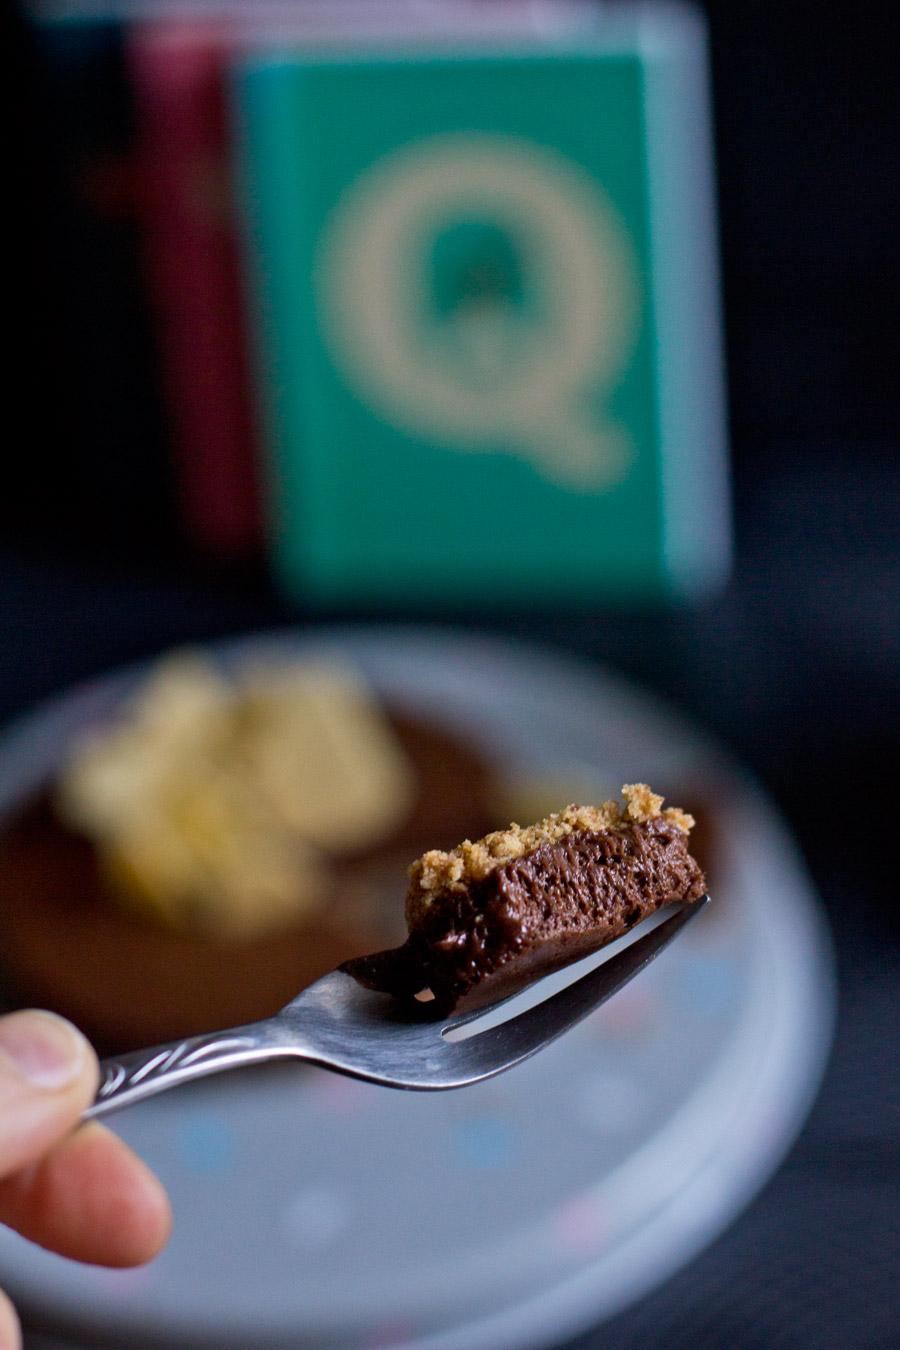 mousse-au-chocolate-tart-bite